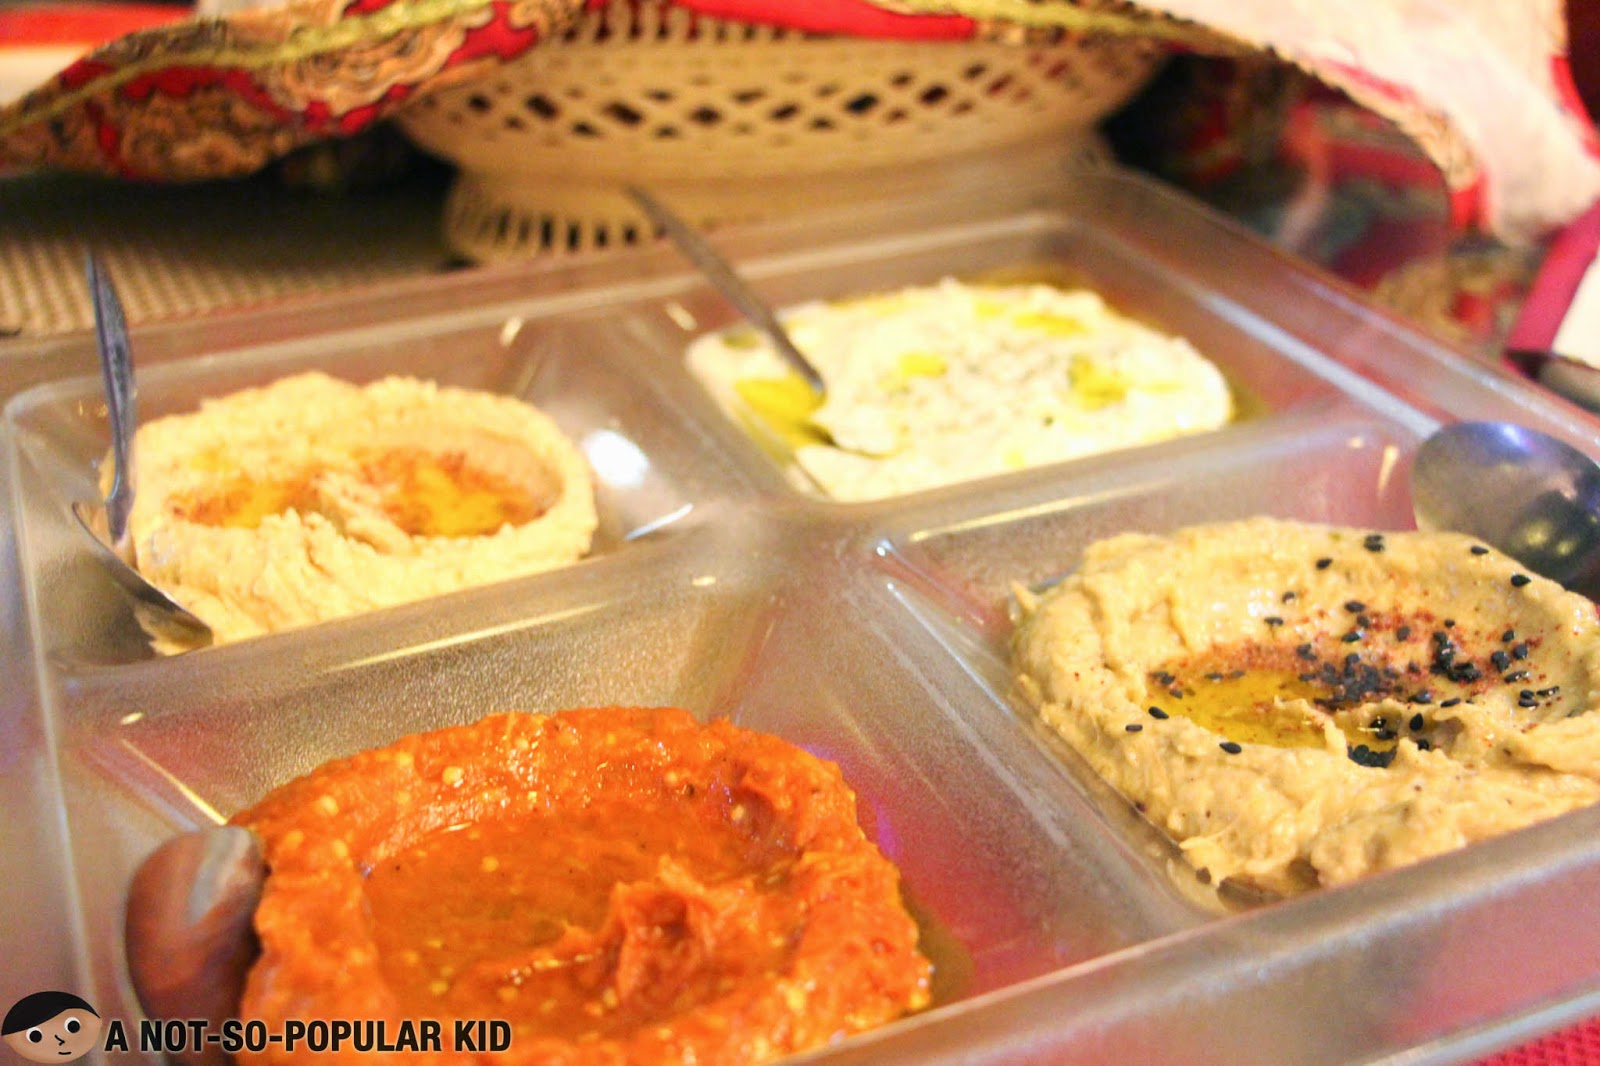 Arya DIp Platter: Hummus, Motabal, Tzitziki & Mirza Ghasemi